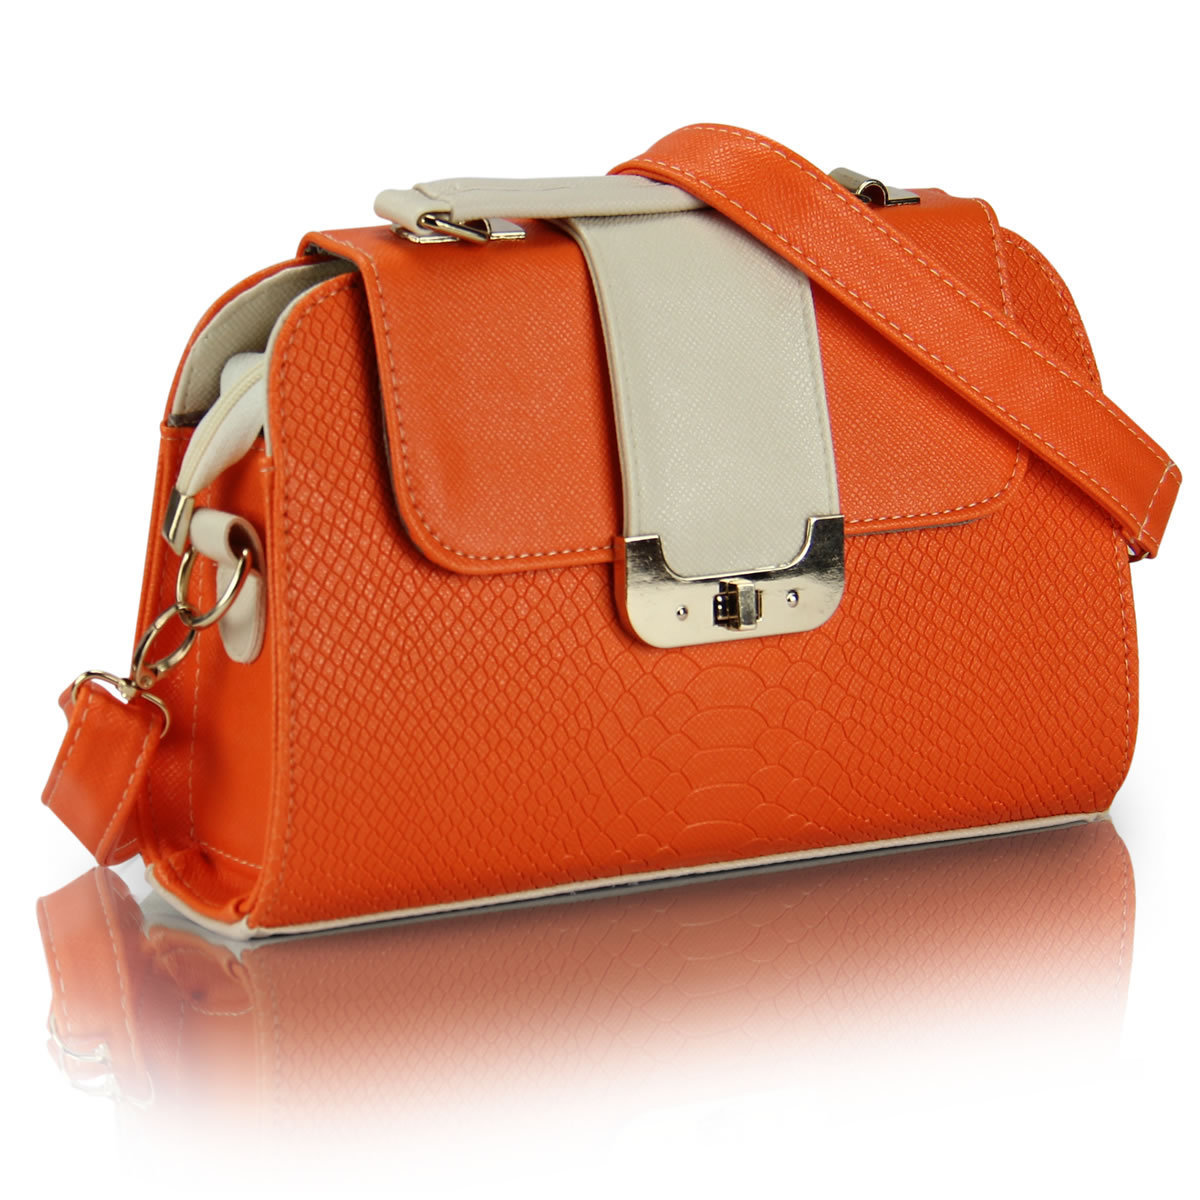 2013 shaping women's bags messenger bag shoulder bag handbag cross-body fashion solid color